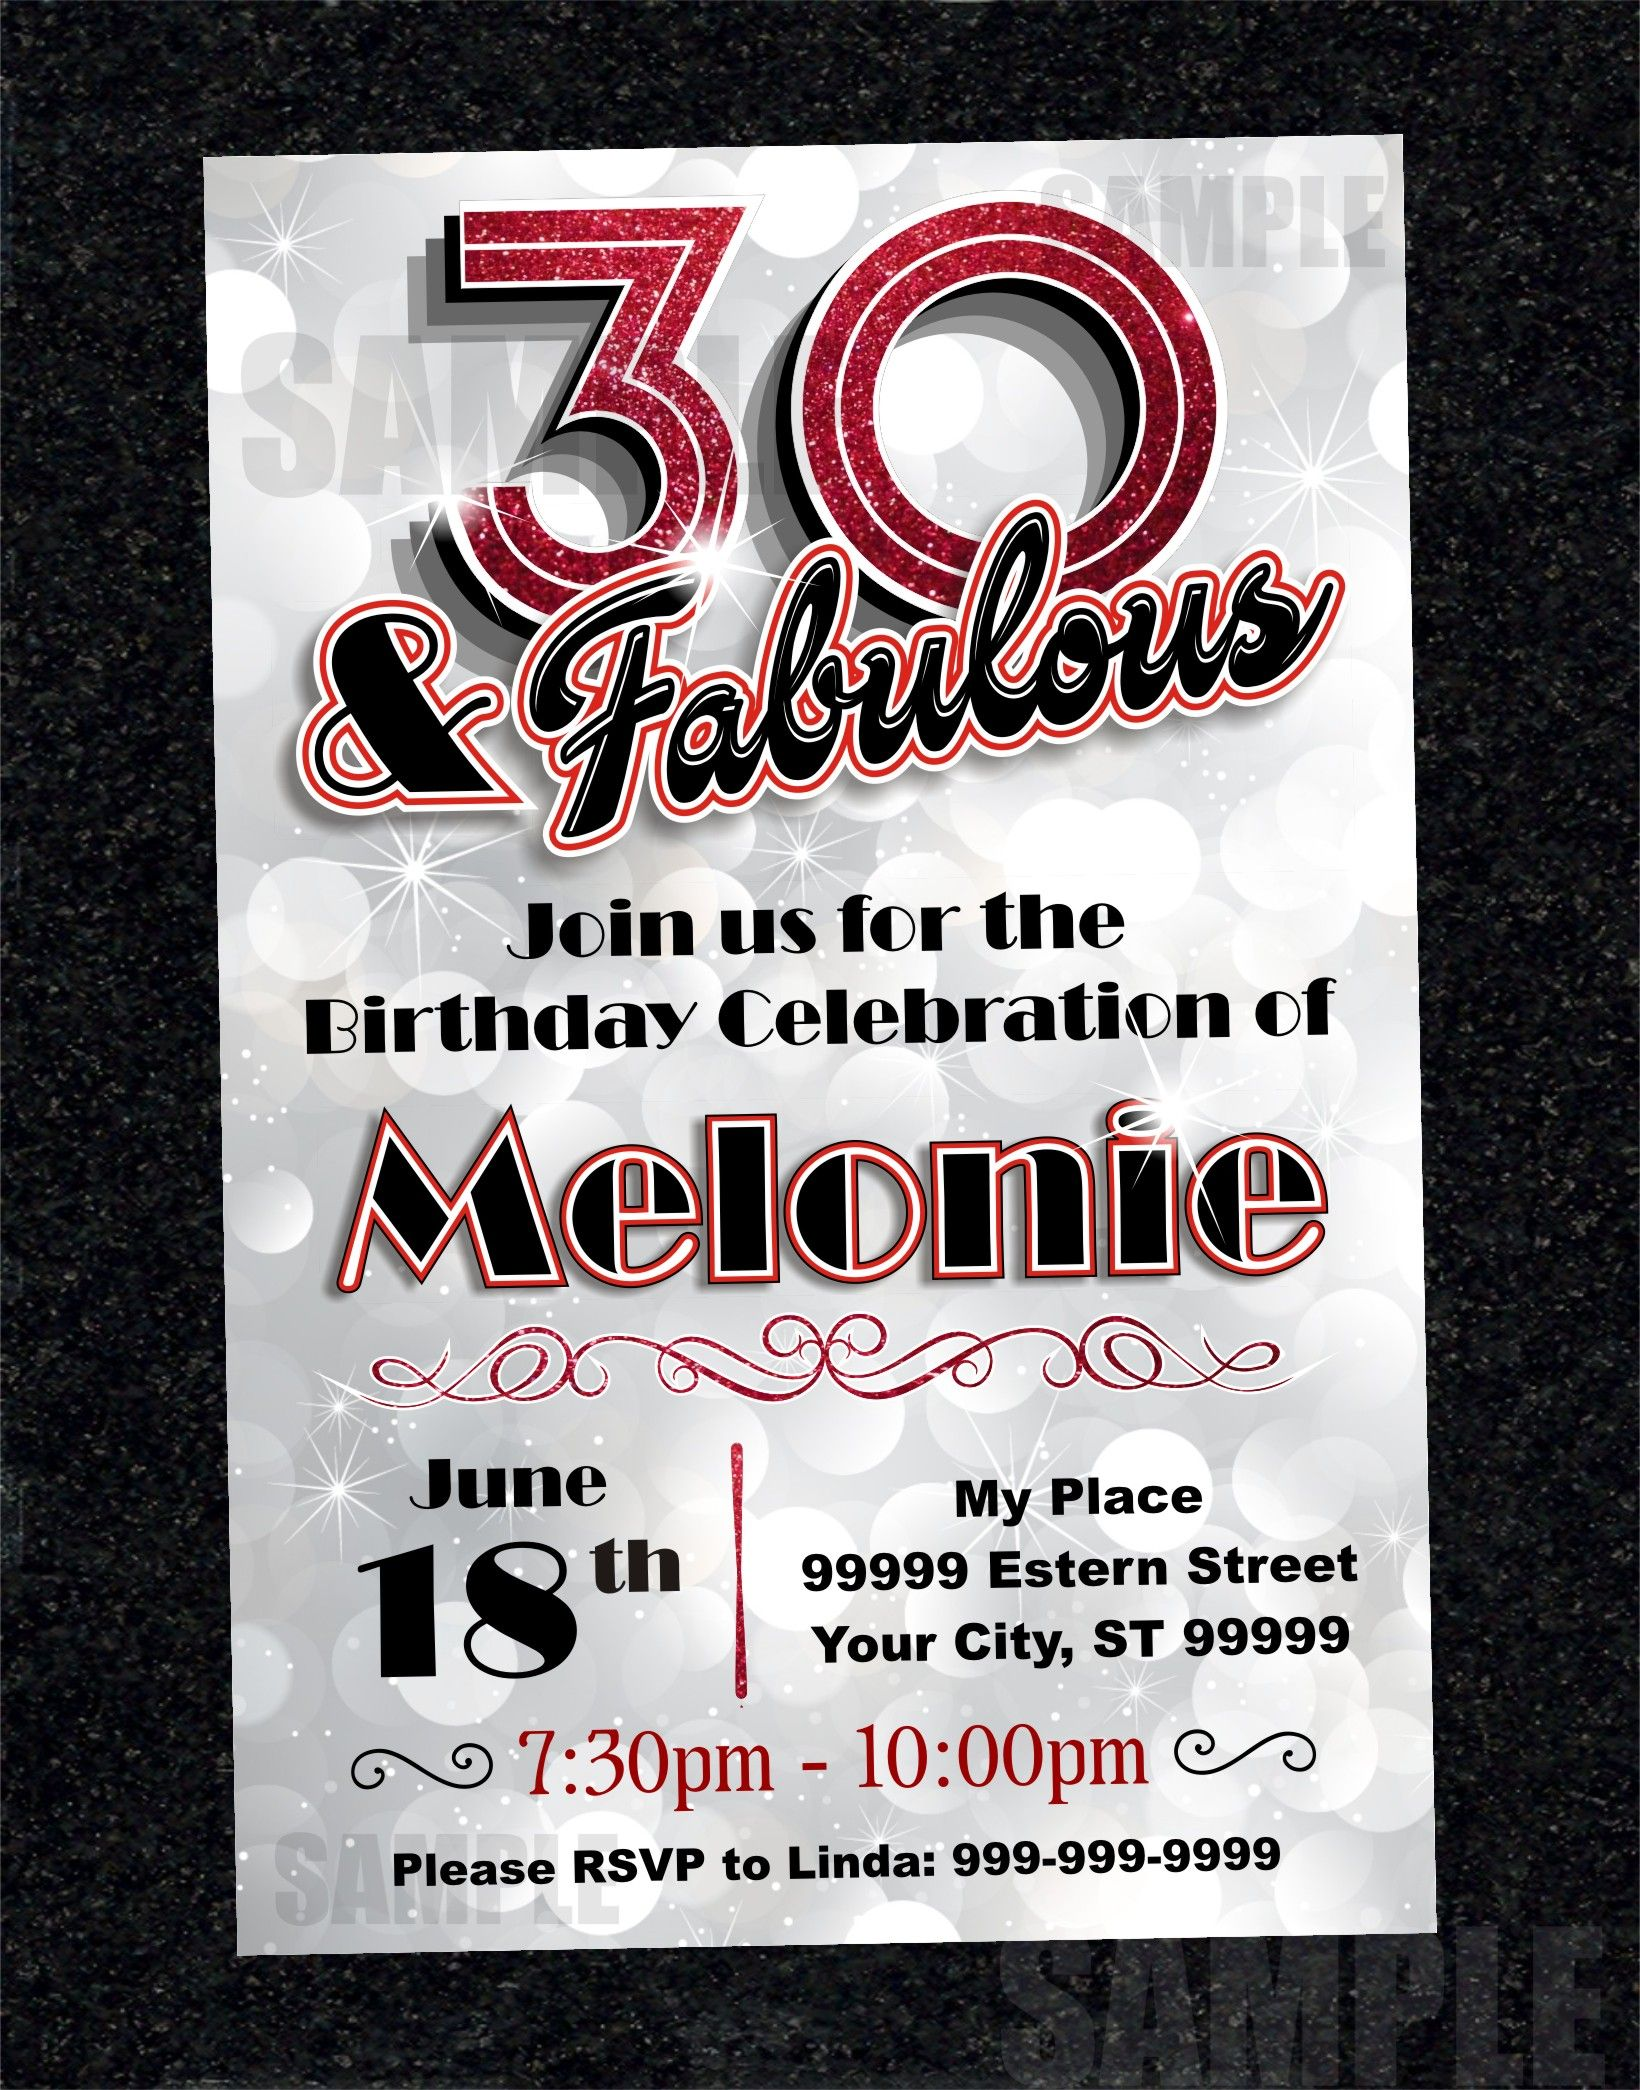 30th Birthday Invitation Card Turning 30 Printable Digital Diy 1094 30th Birthday Party Invitations 30th Birthday Invitations Birthday Invitations Girl